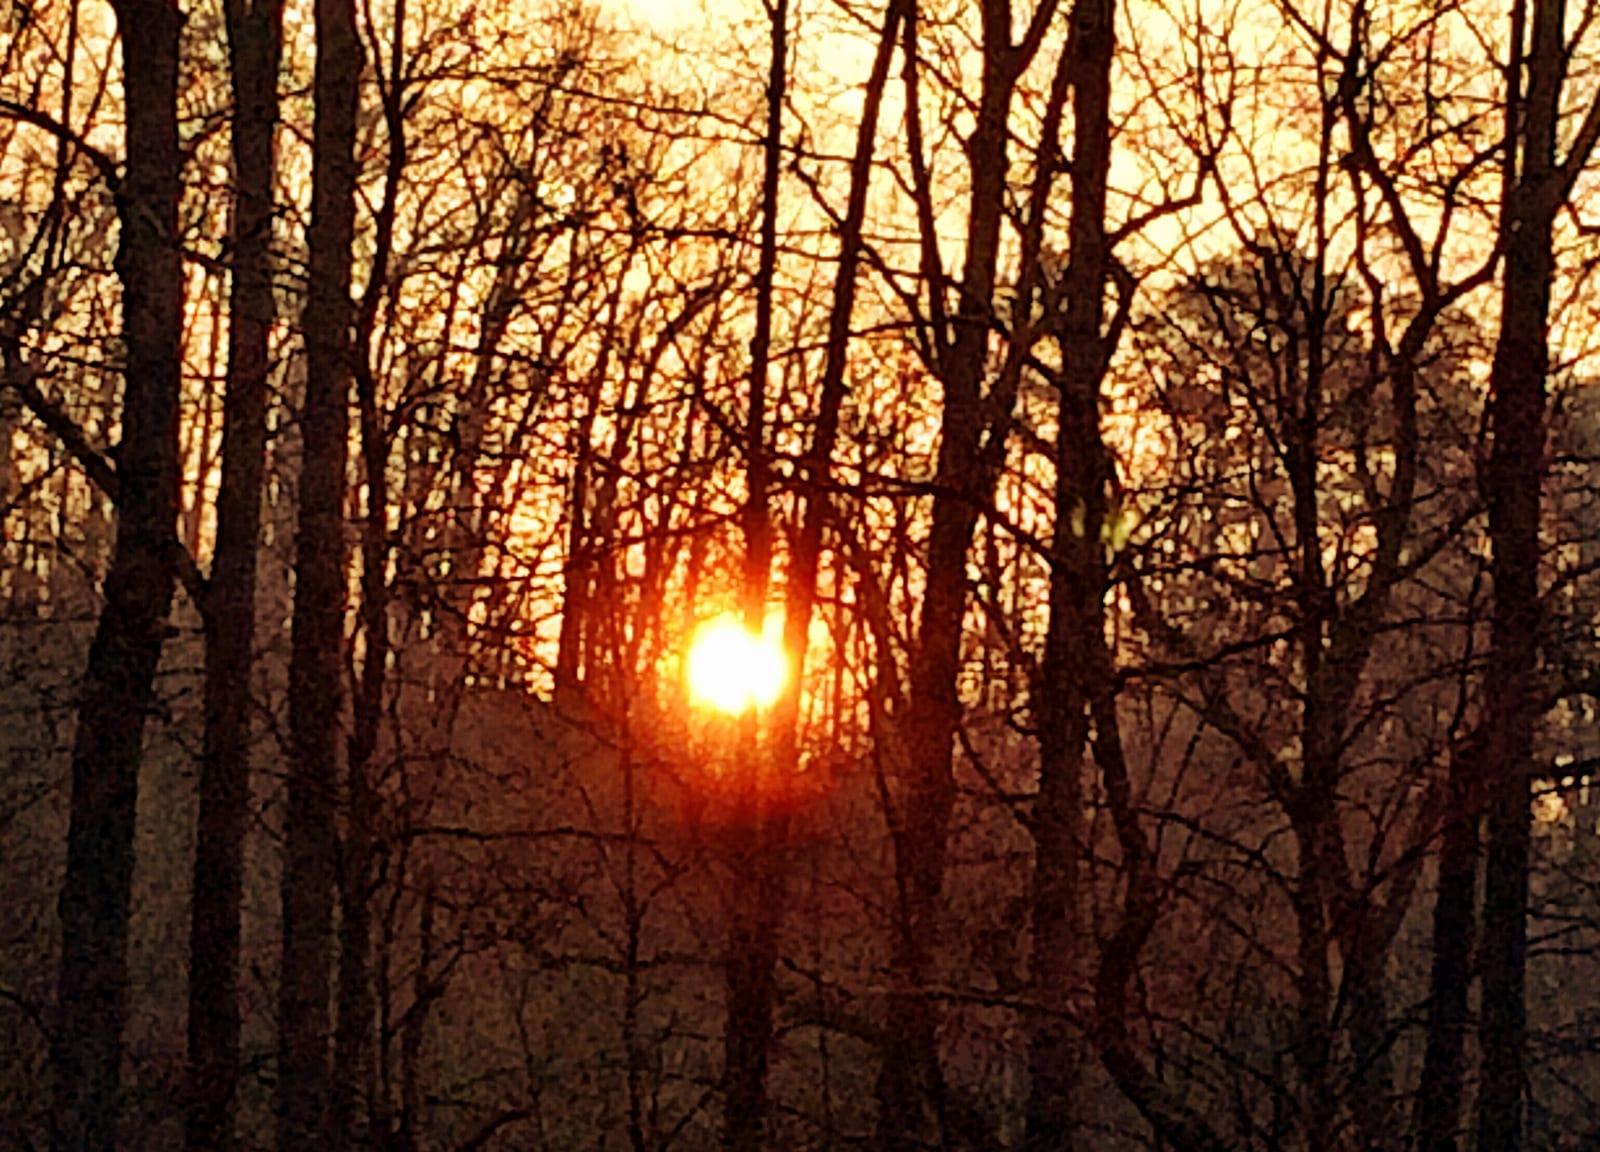 Backyard sunrise this morning.